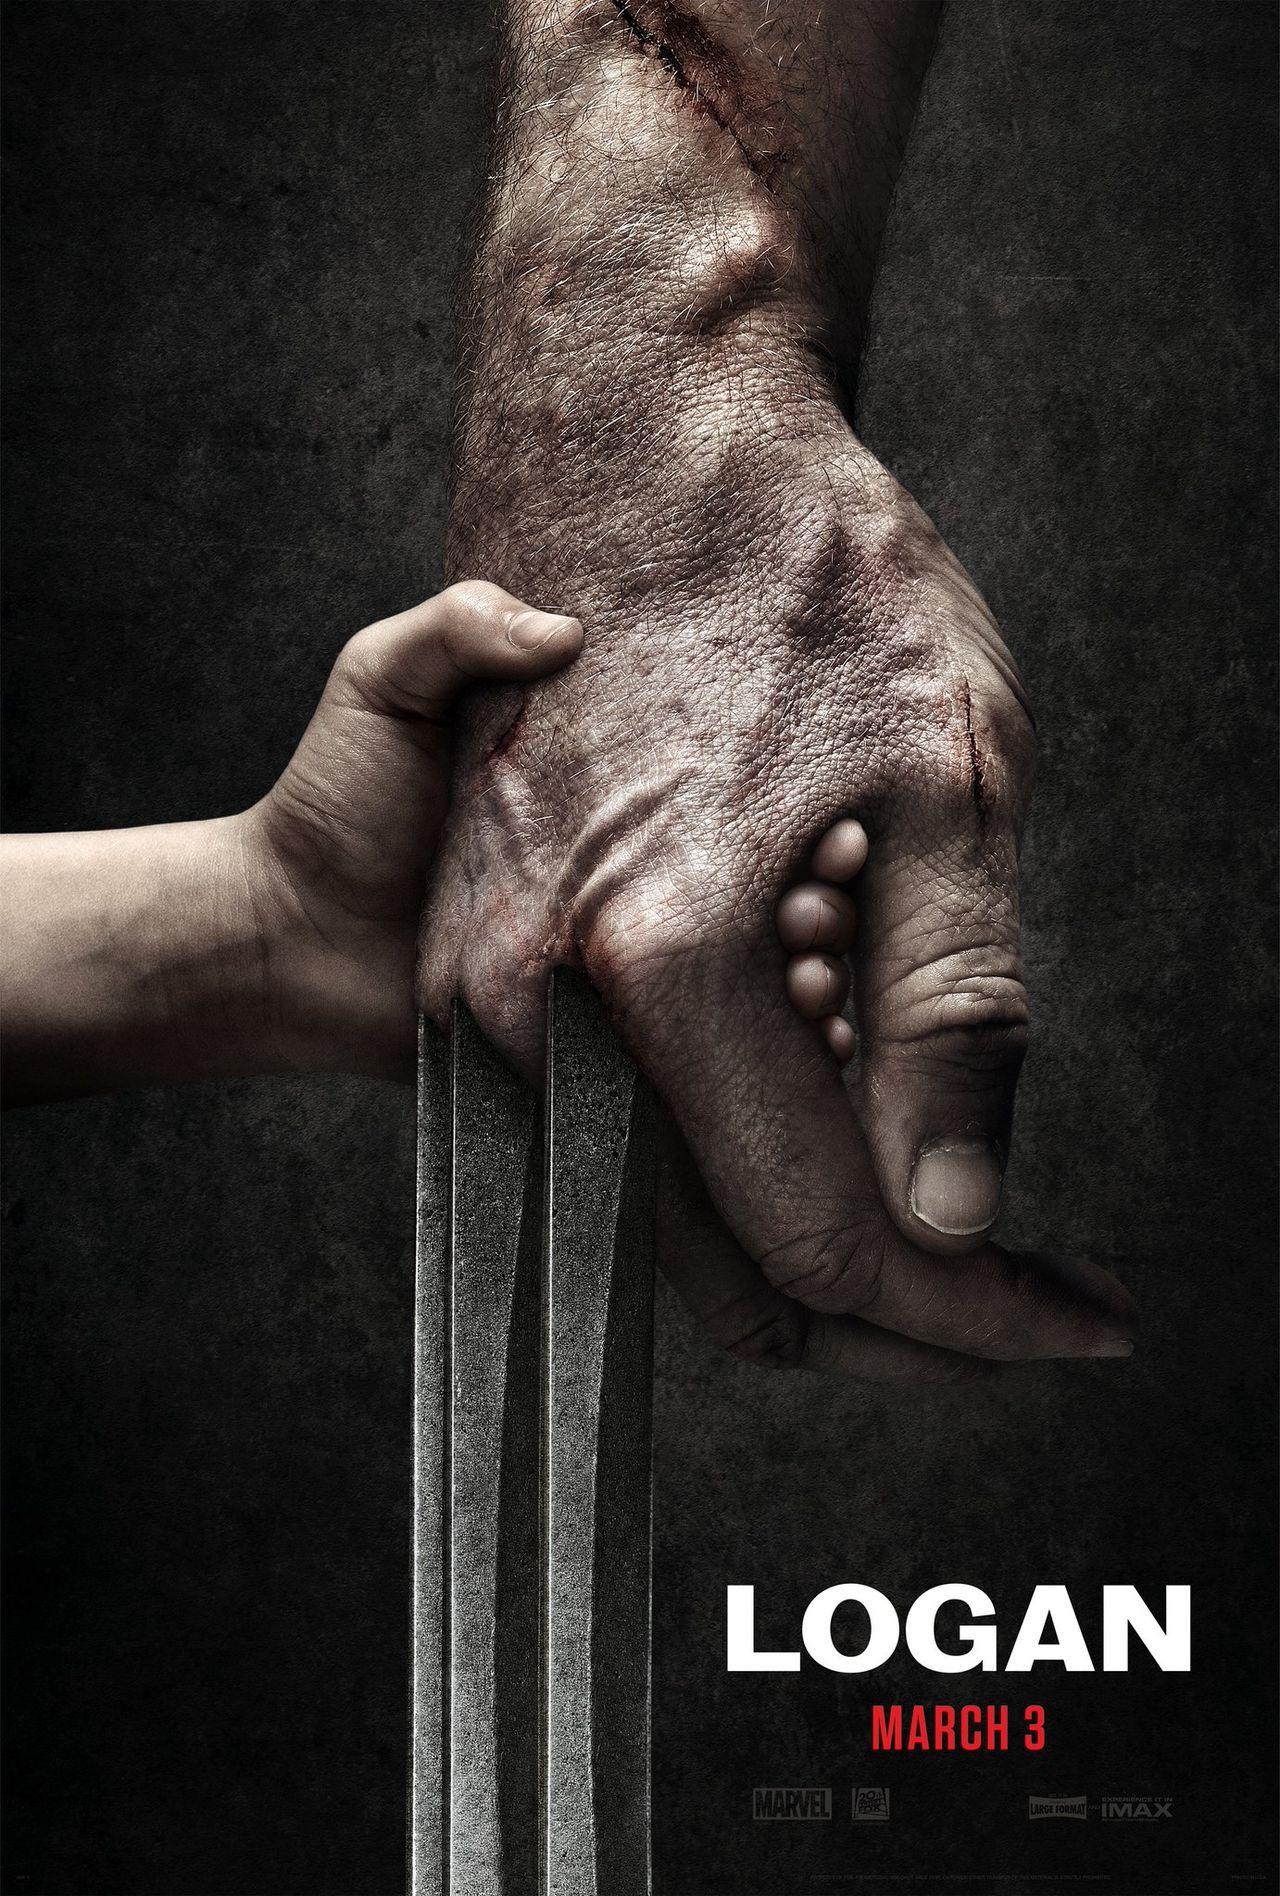 Wolverine 3 kommer heta Logan